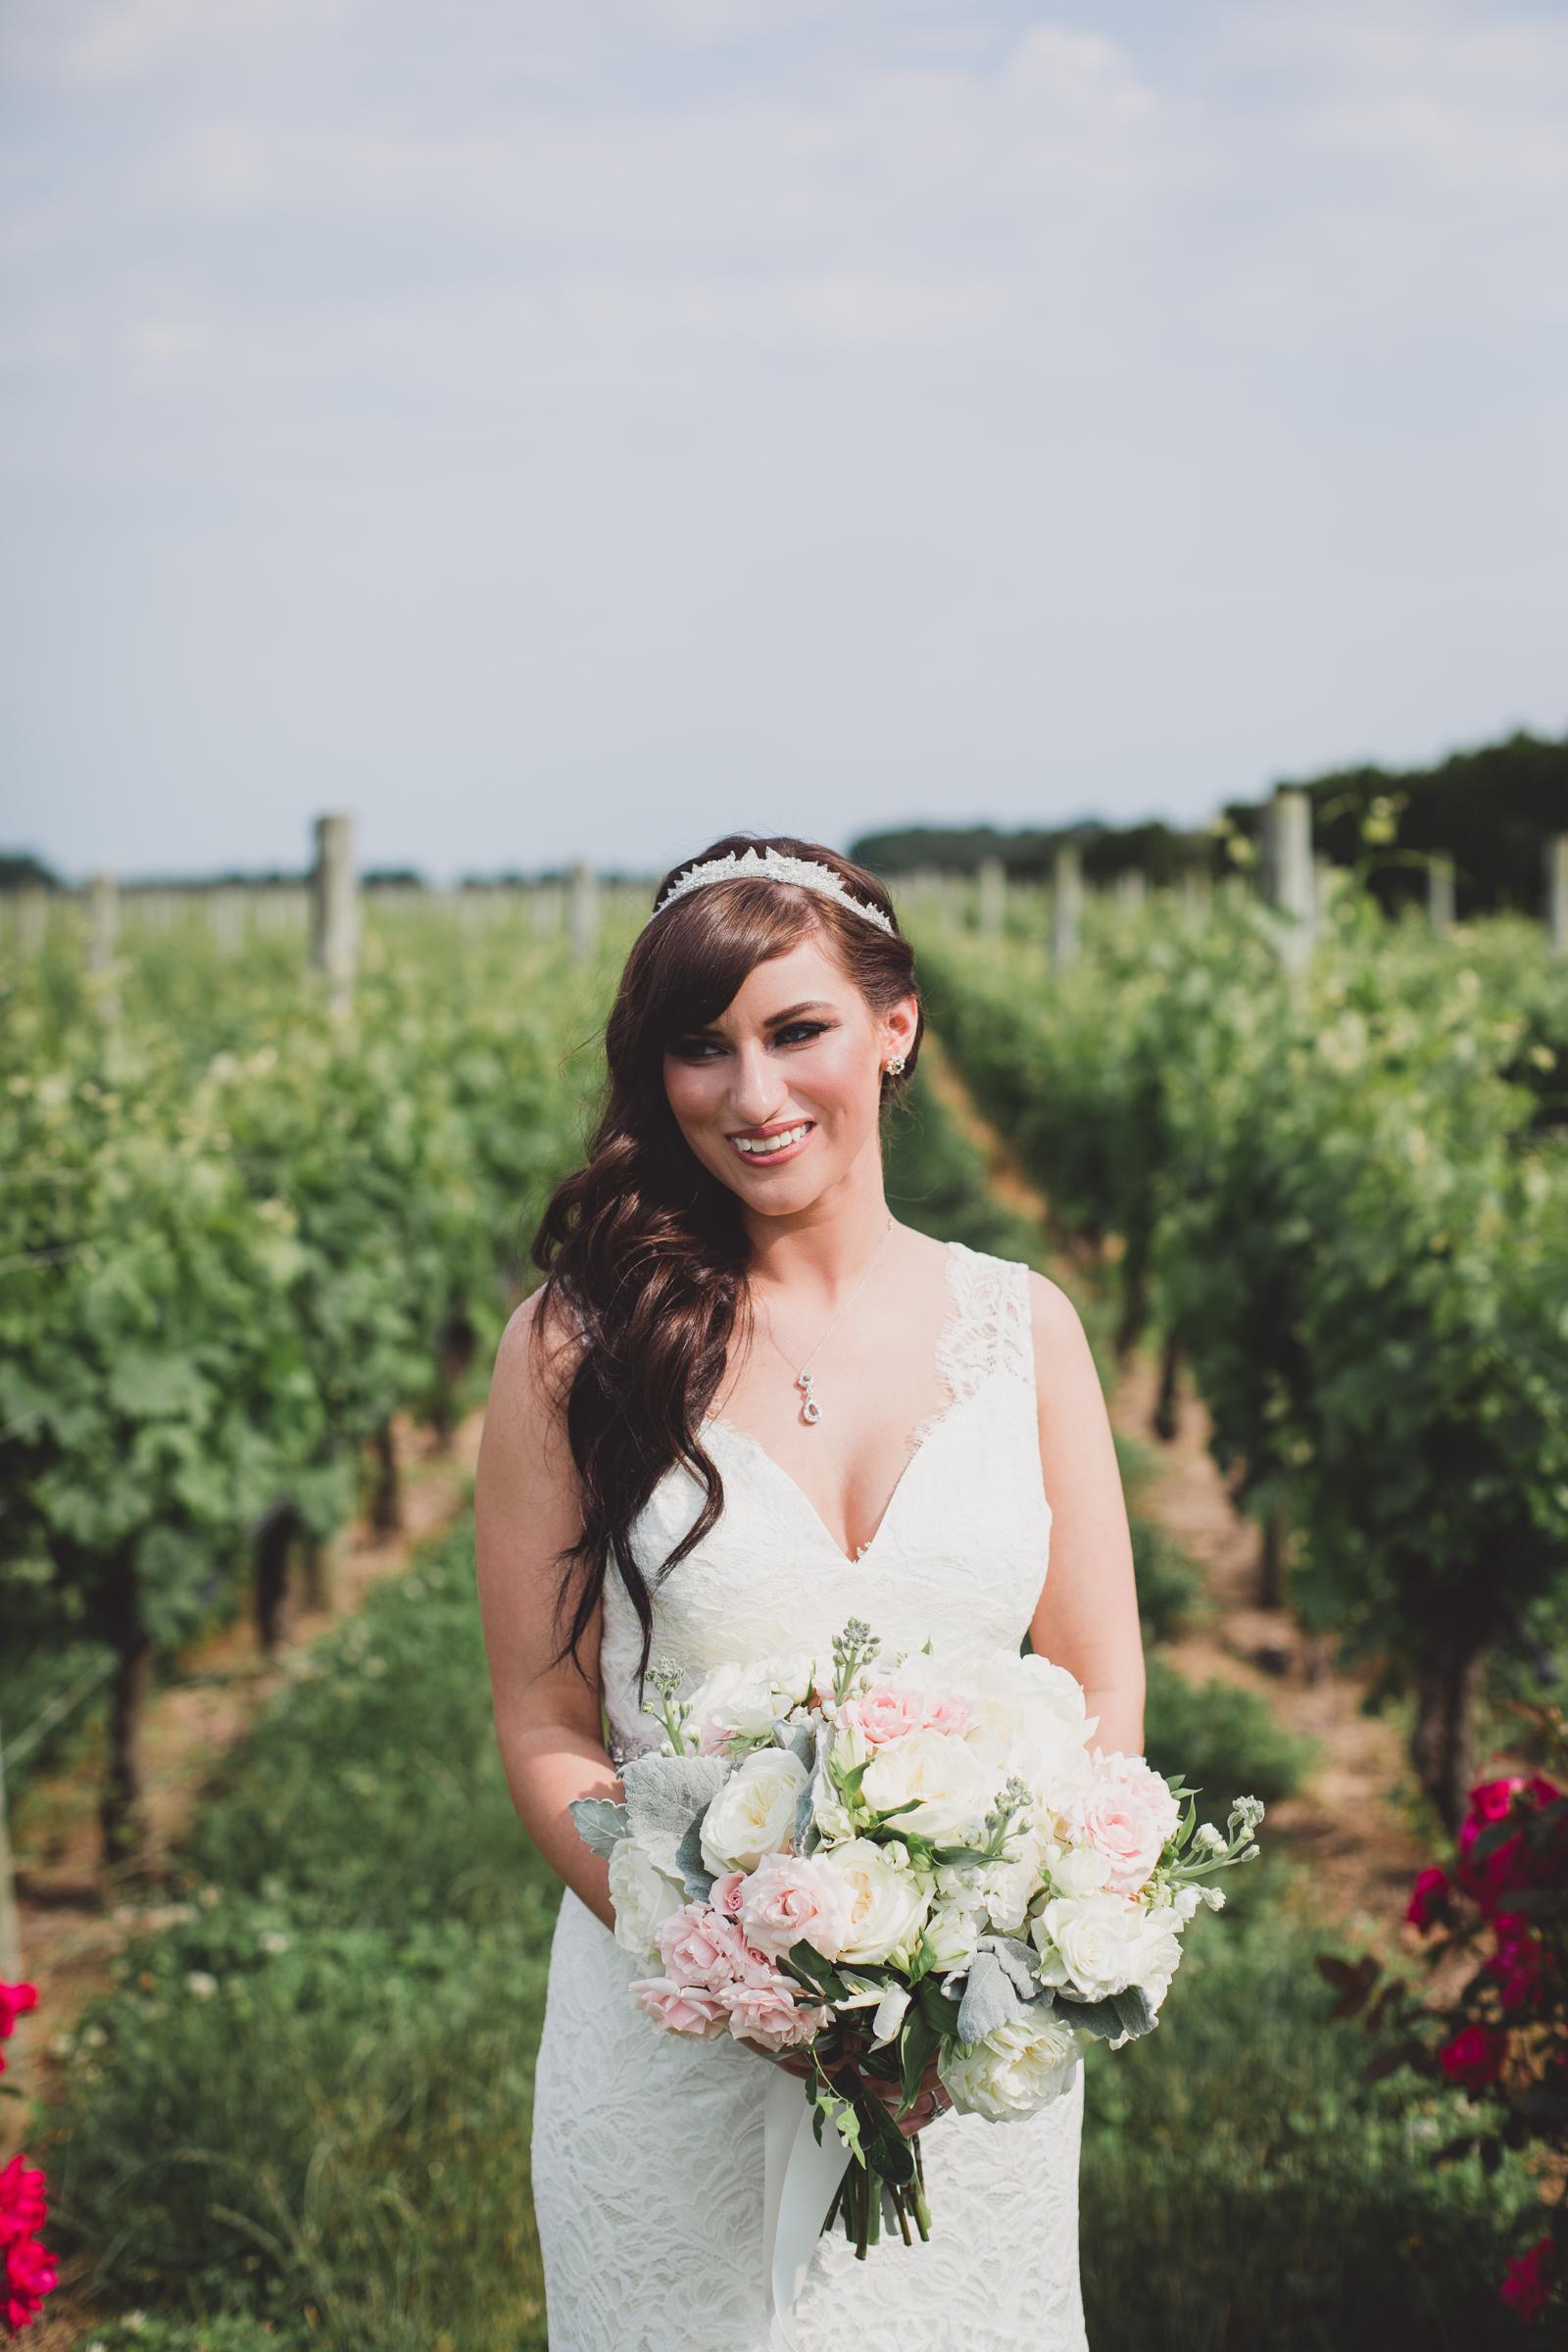 Martha-Clara-Vineyard-Long-Island-Documentary-Wedding-Photographer-22.jpg